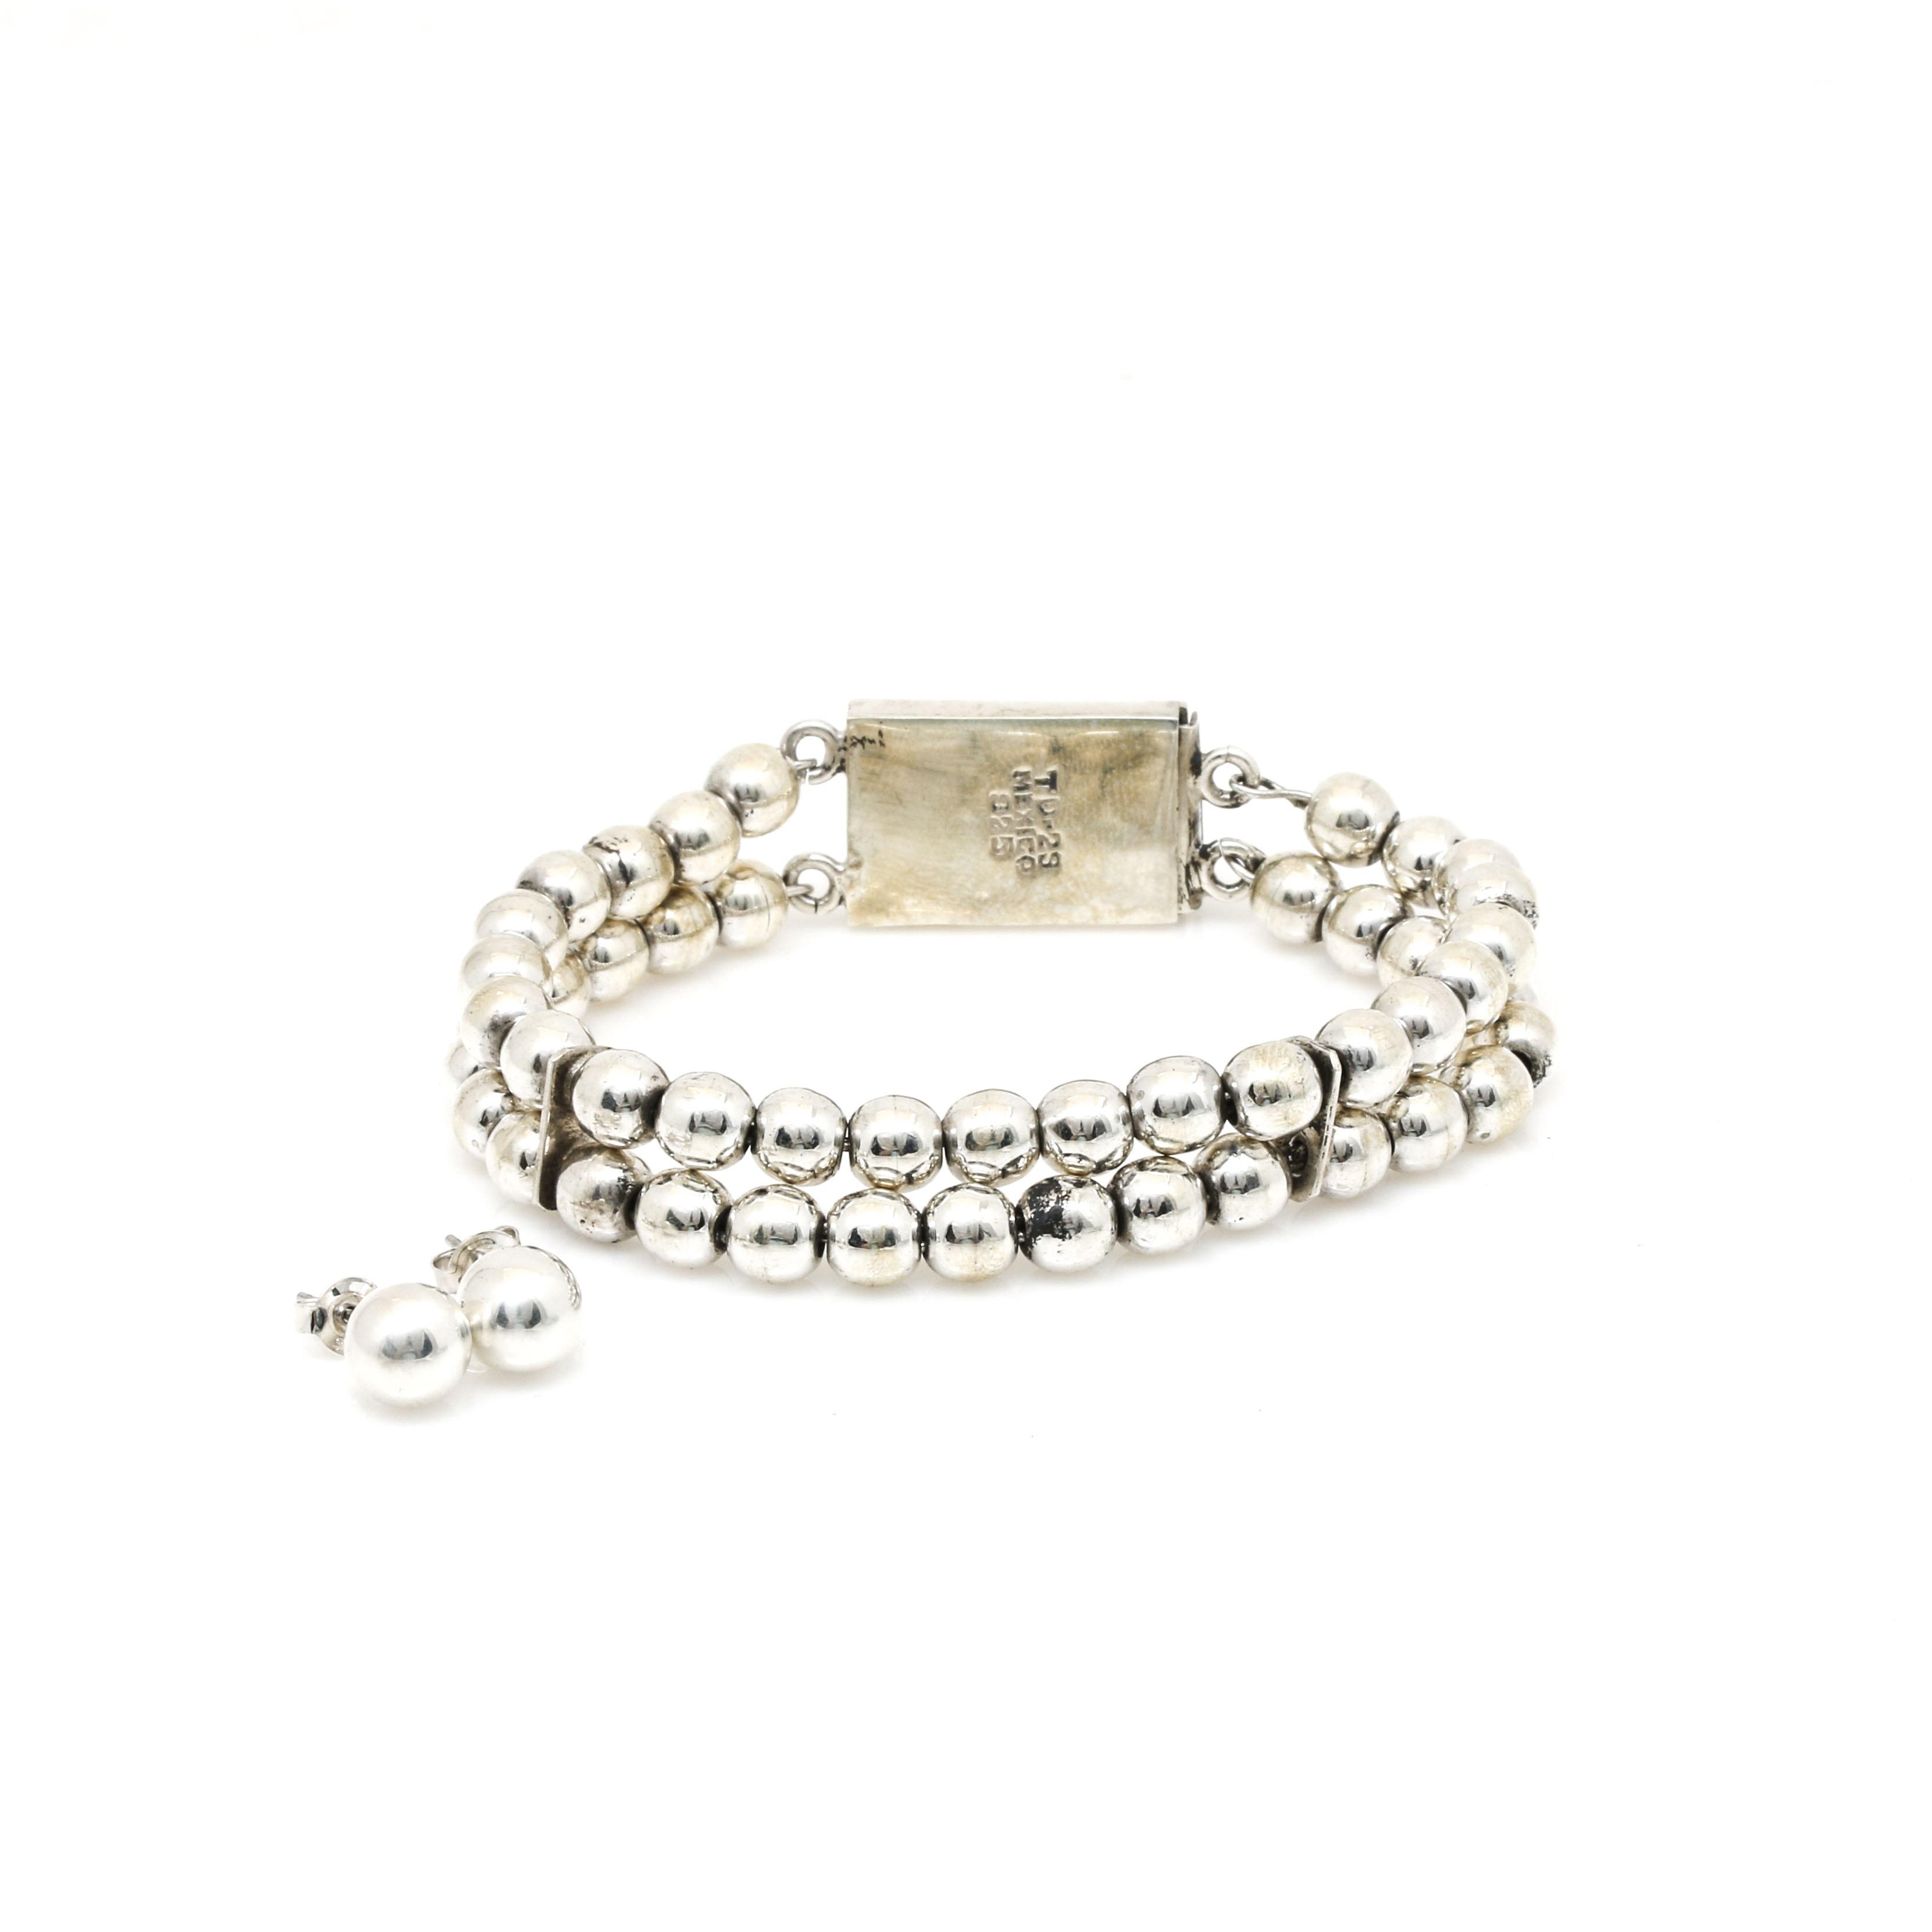 Taxco Sterling Silver Bead Bracelet and Ball Stud Earrings